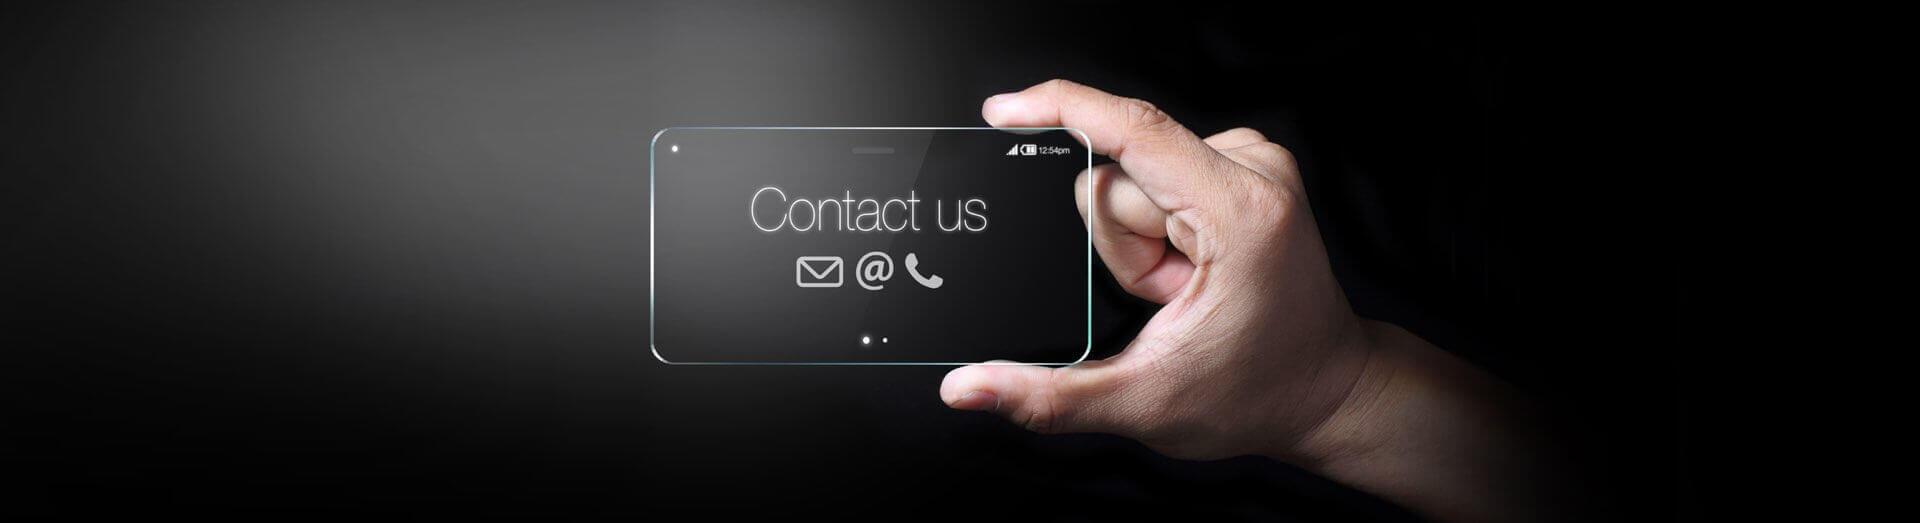 header-contact-us